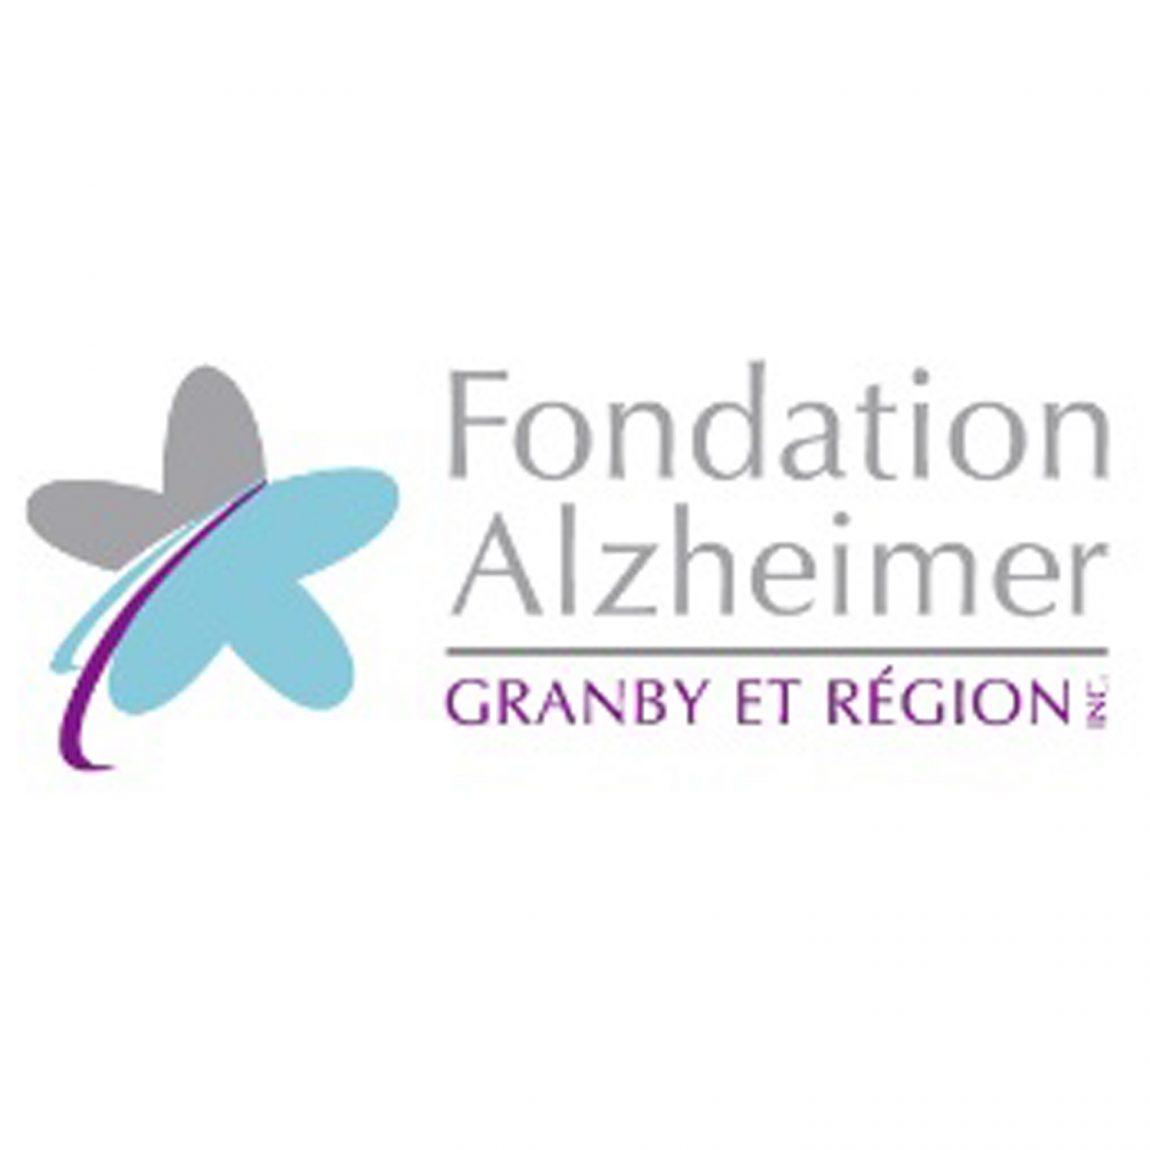 Fondation-Alzheimer.jpg